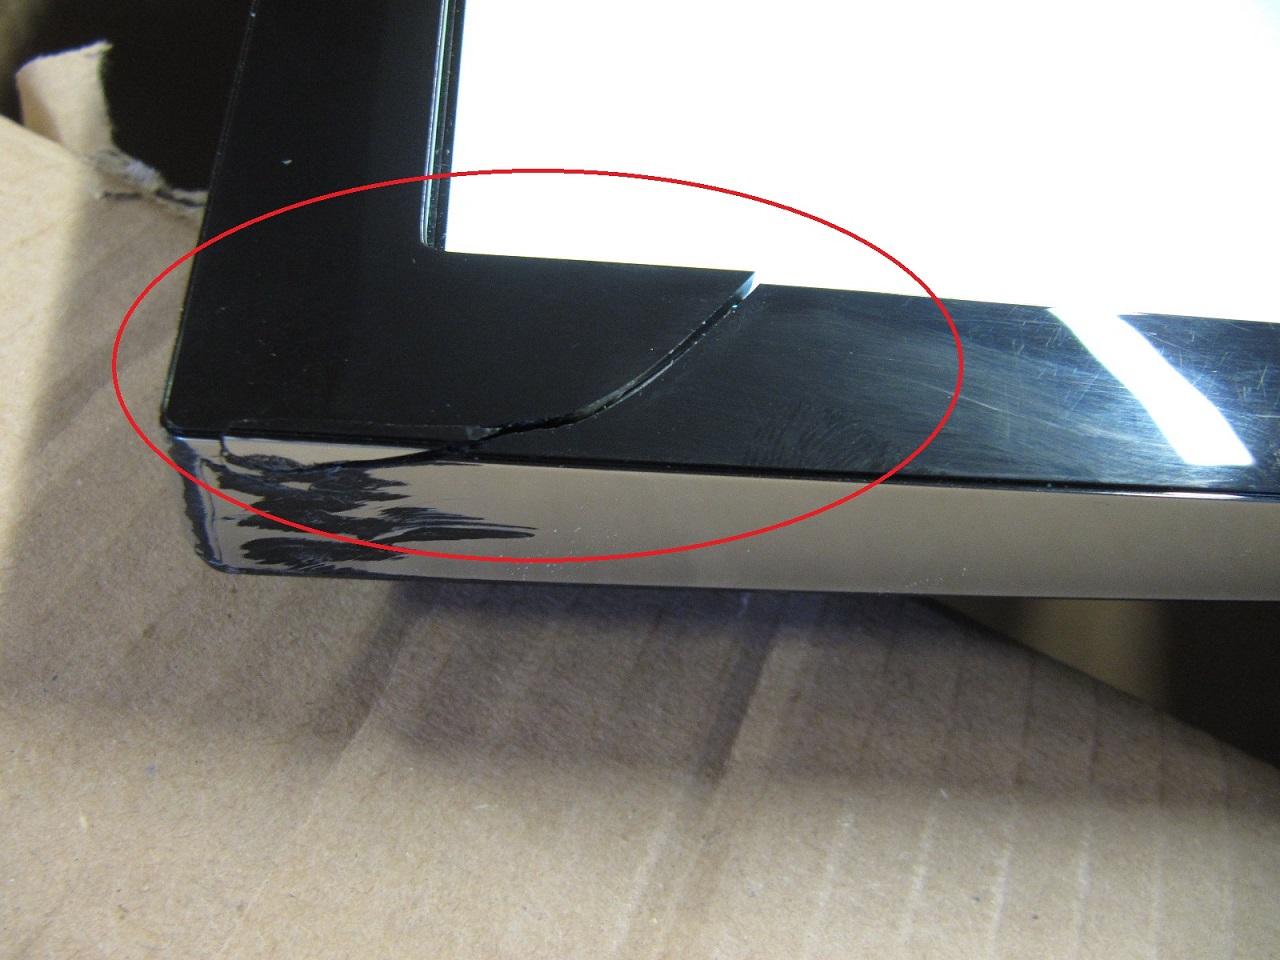 samsung u28d590d 71 12cm 28 zoll 4k lcd monitor ohne standfu rechnung d14291 ebay. Black Bedroom Furniture Sets. Home Design Ideas